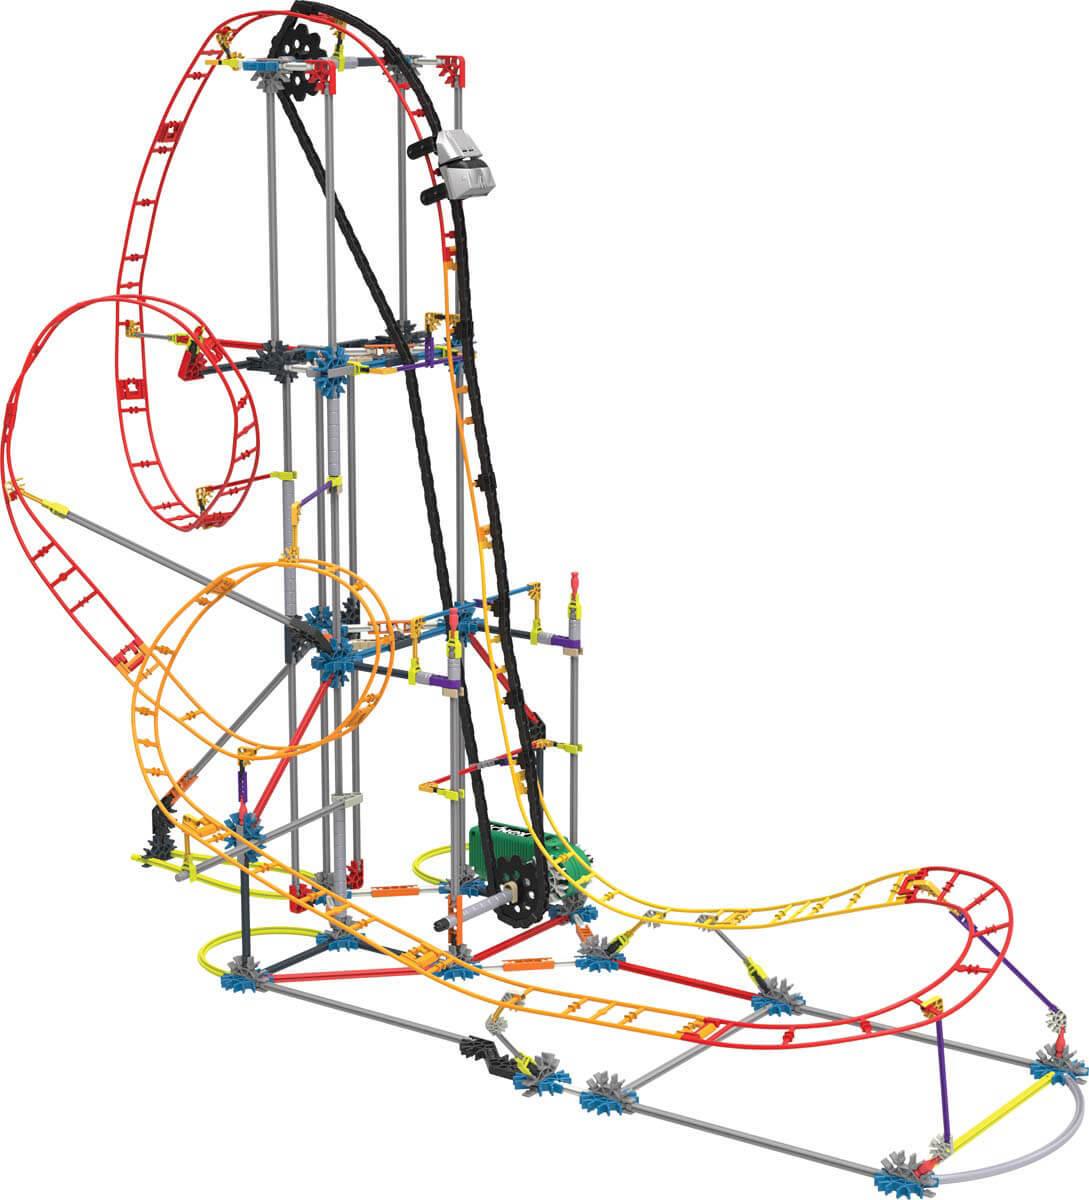 1089x1200 K'Nex Thrill Rides Electric Inferno Roller Coaster Constructionk